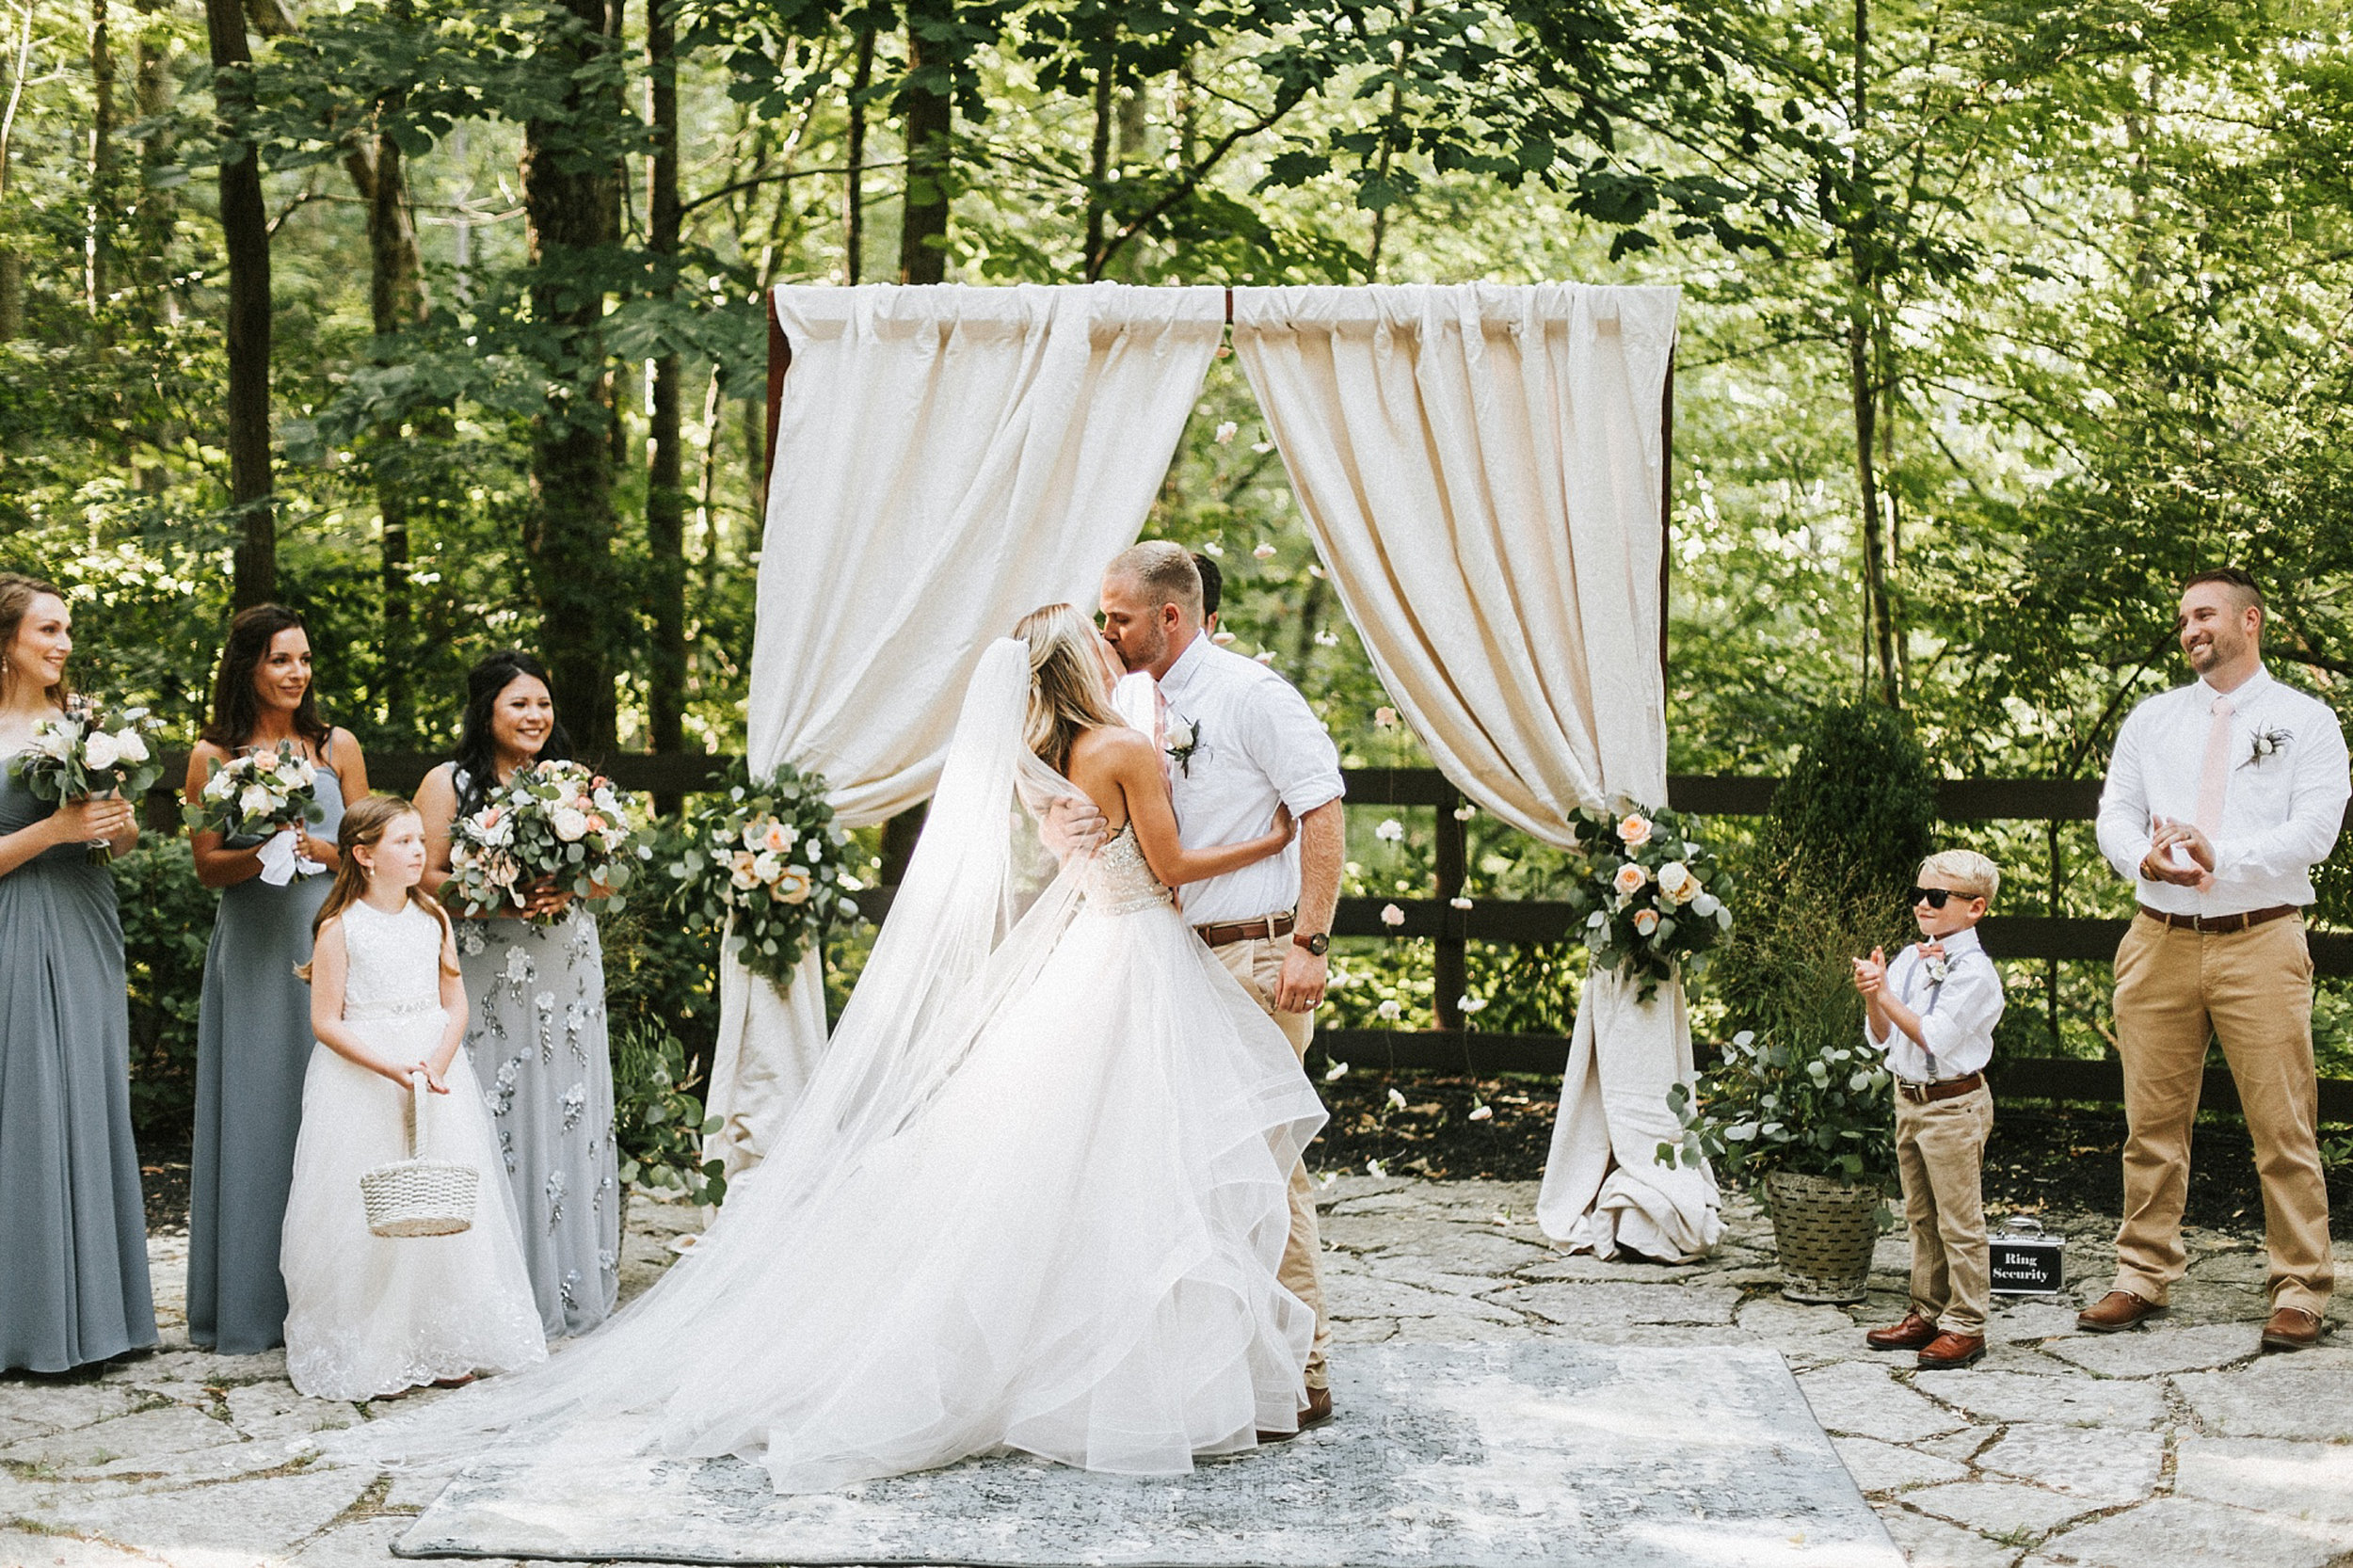 Brooke Townsend Photography - Cincinnati Wedding Photographer (80 of 153).jpg